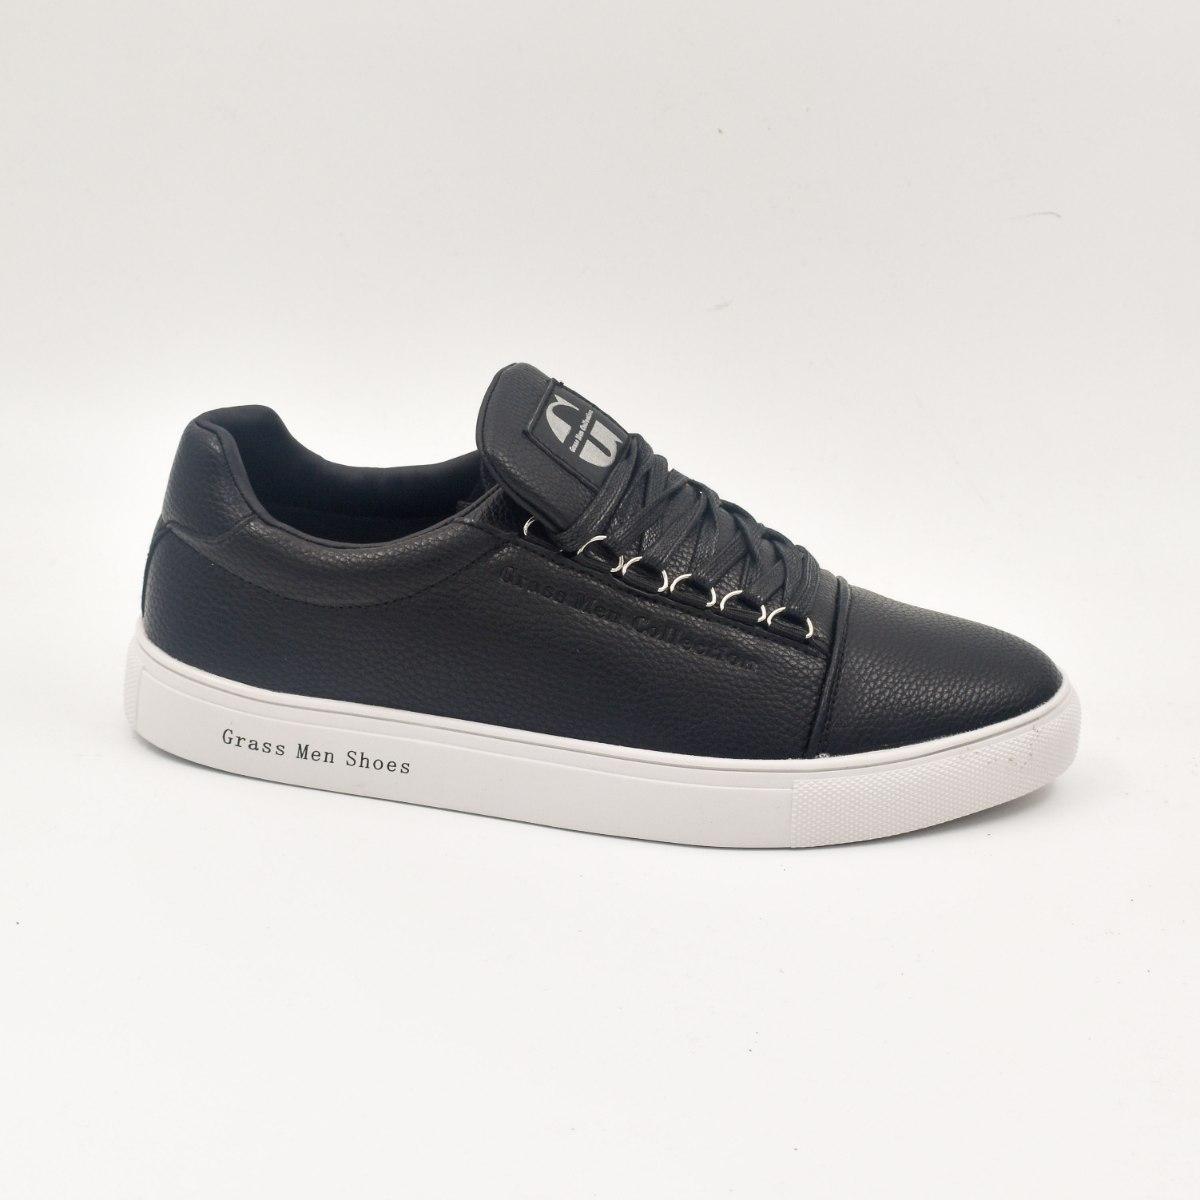 נעלי סניקרס לגברים - אנטוורפן